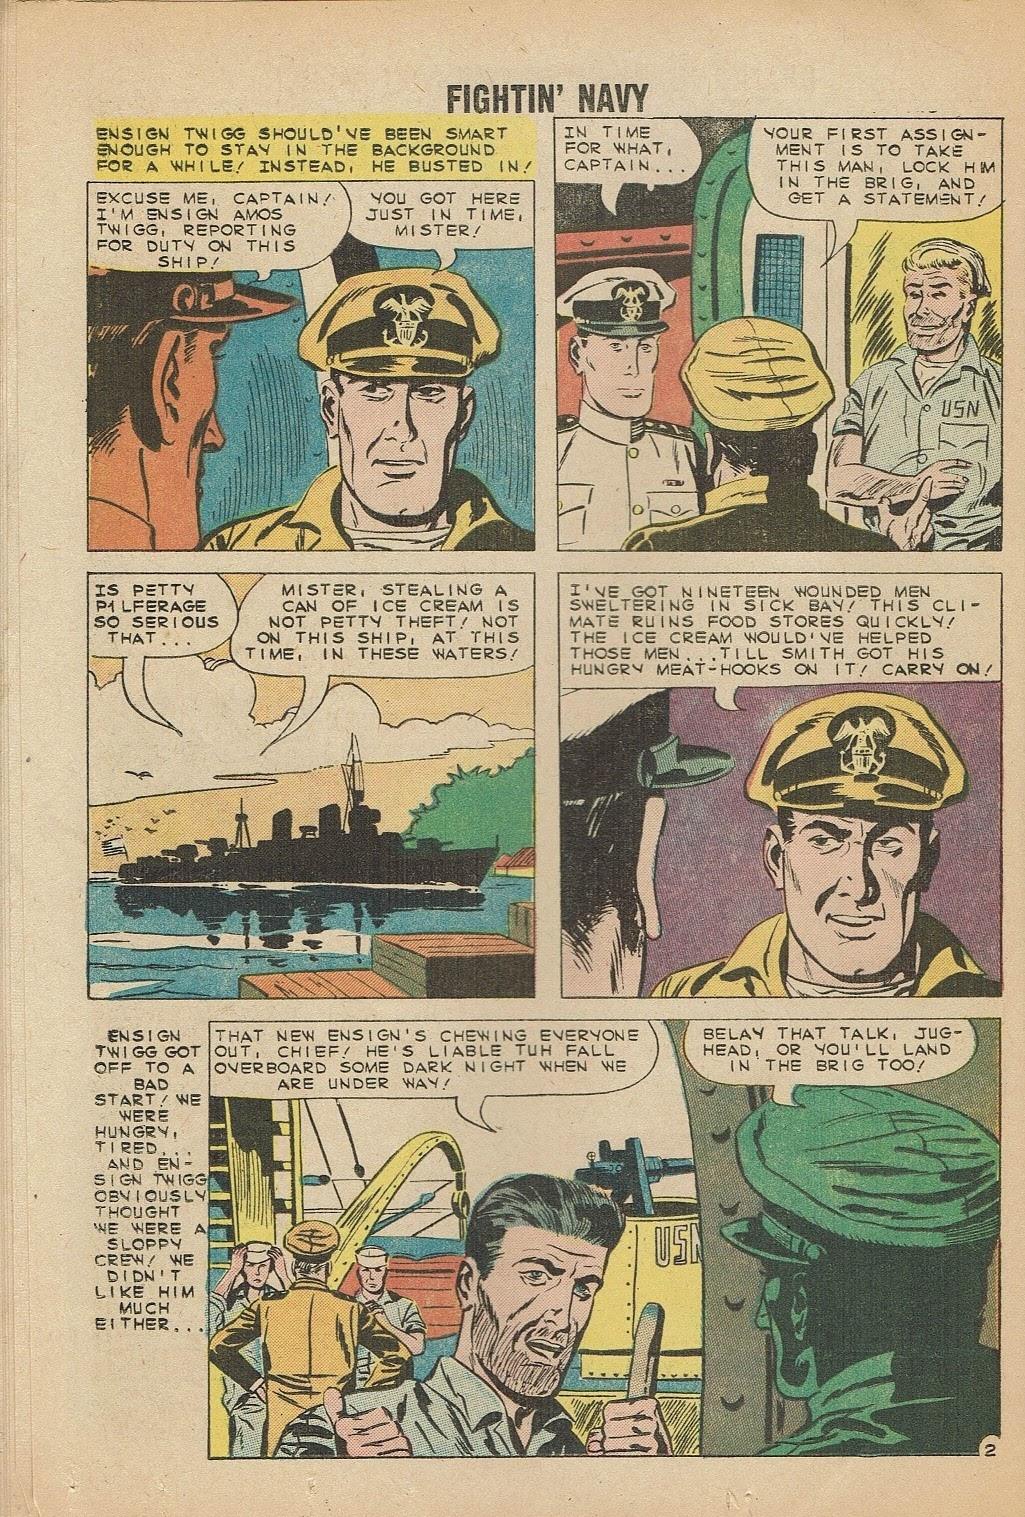 Read online Fightin' Navy comic -  Issue #91 - 16